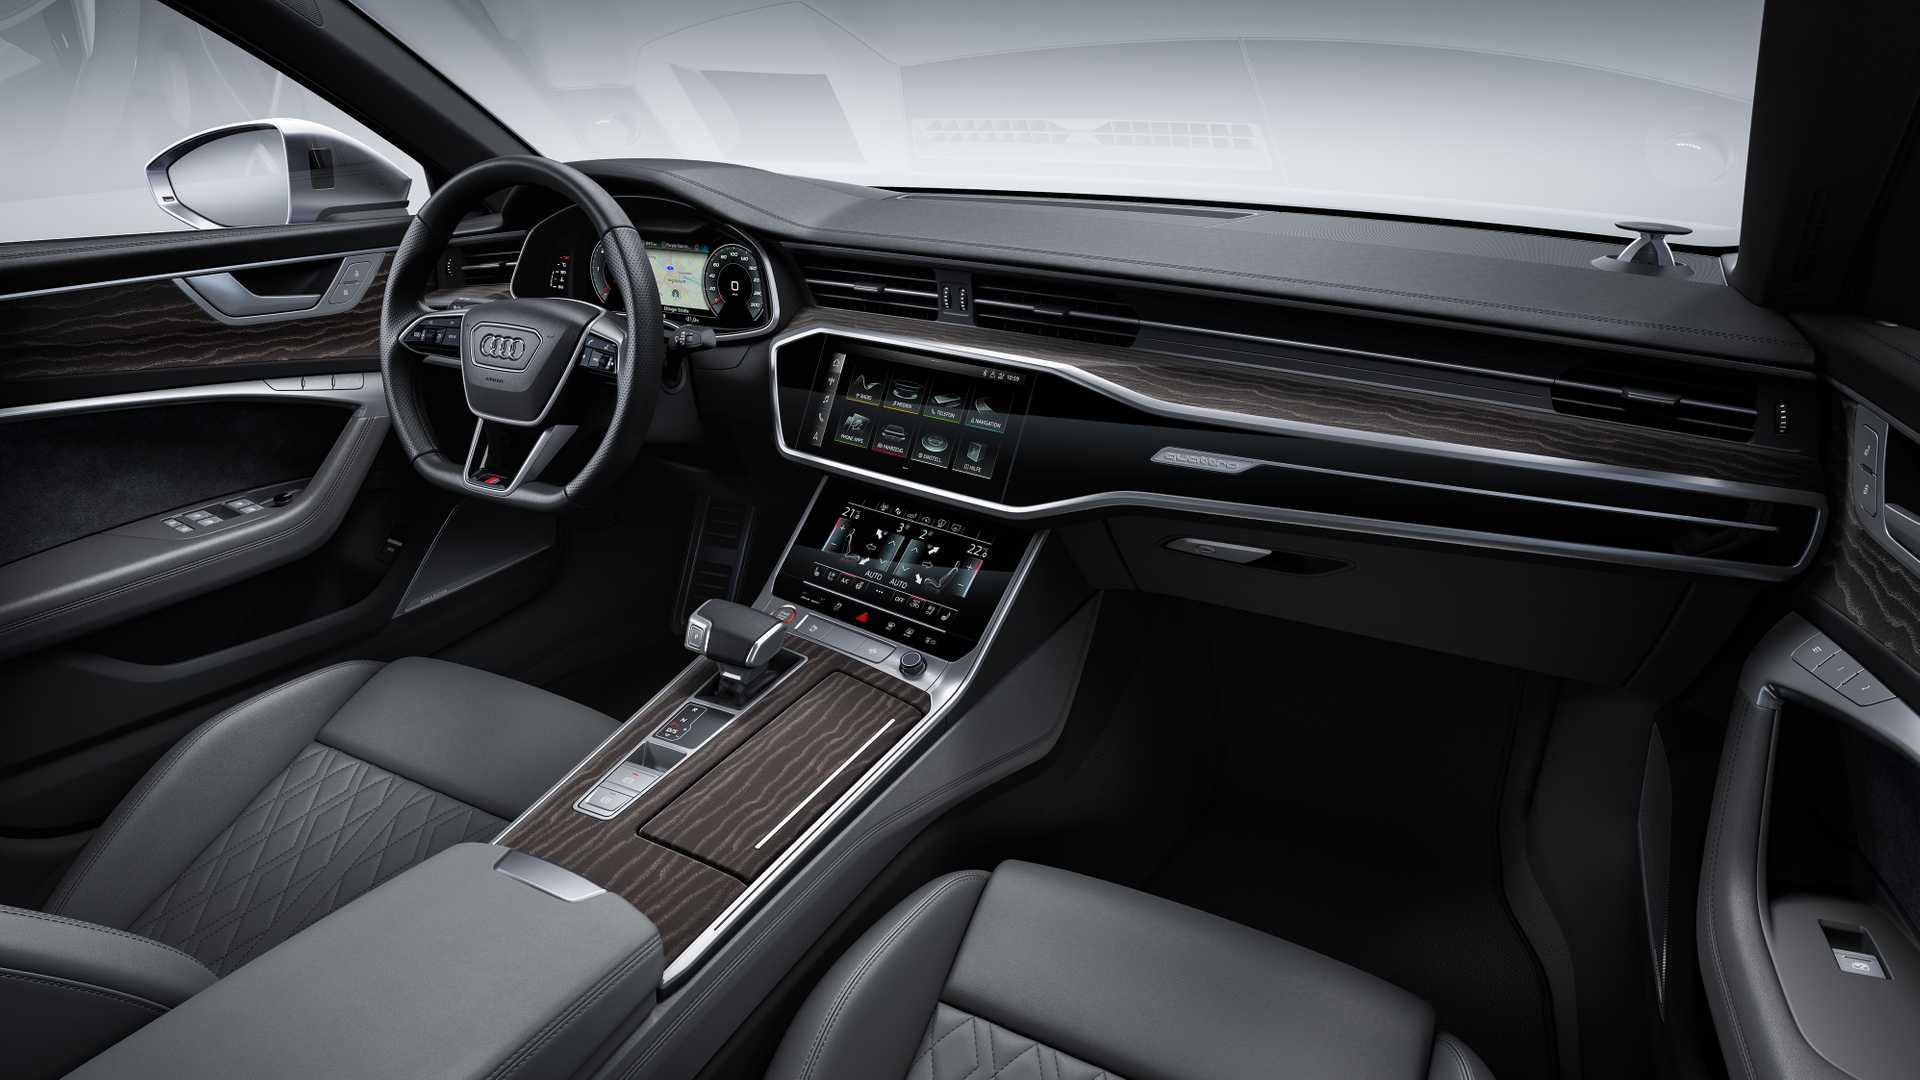 2020-audi-s6-sedan-tdi (8).jpg